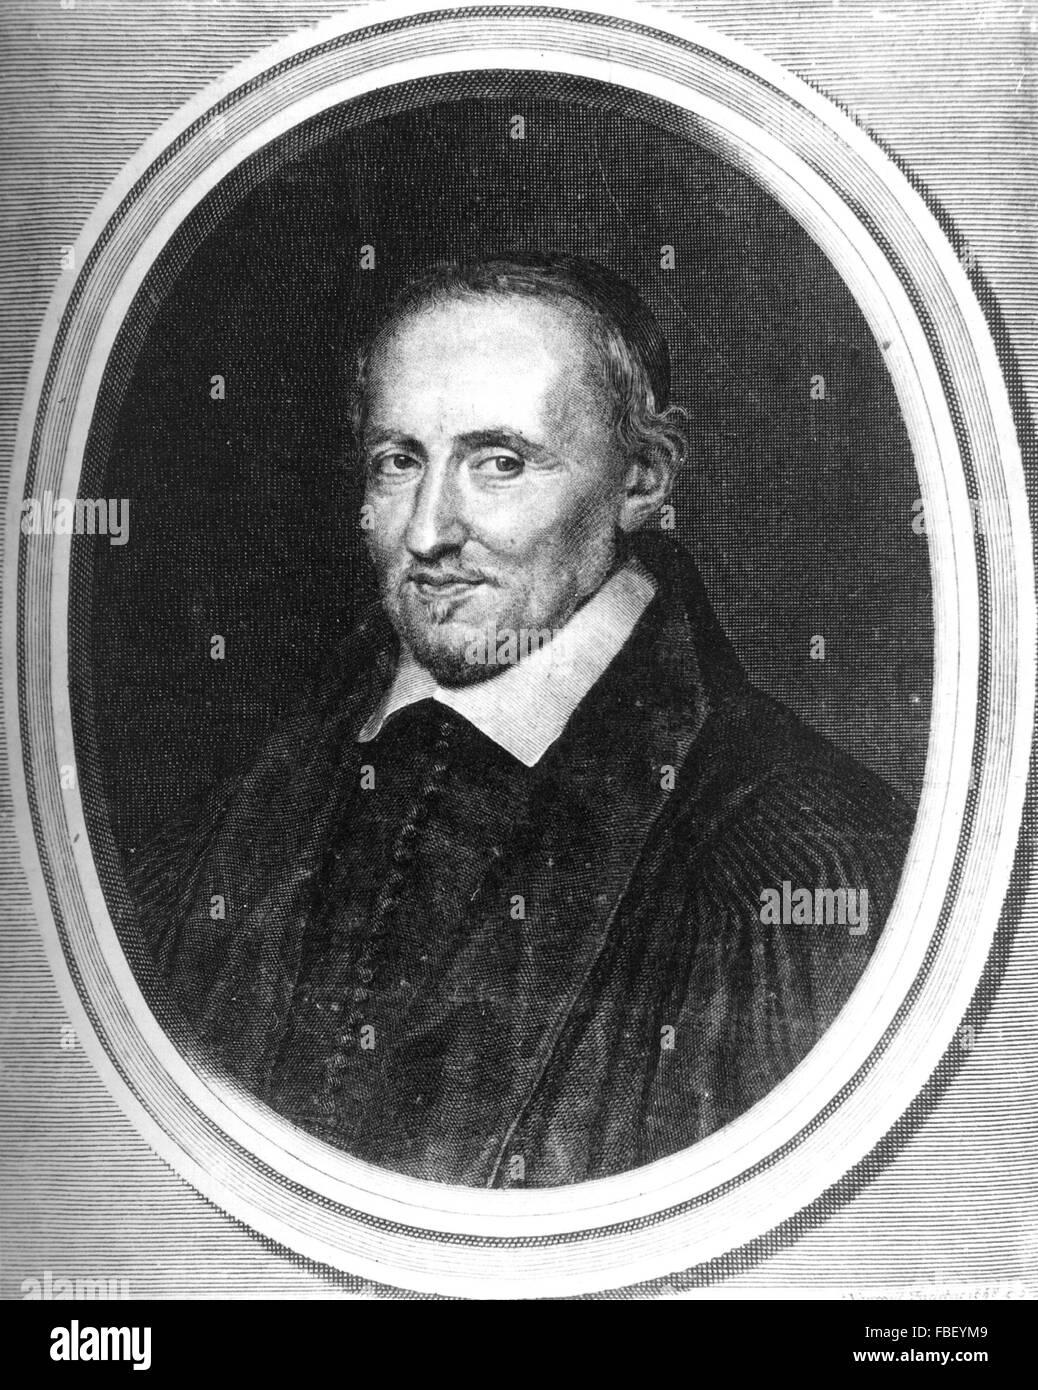 PIERRE GASSENDI (1592-1655) French philospher - Stock Image